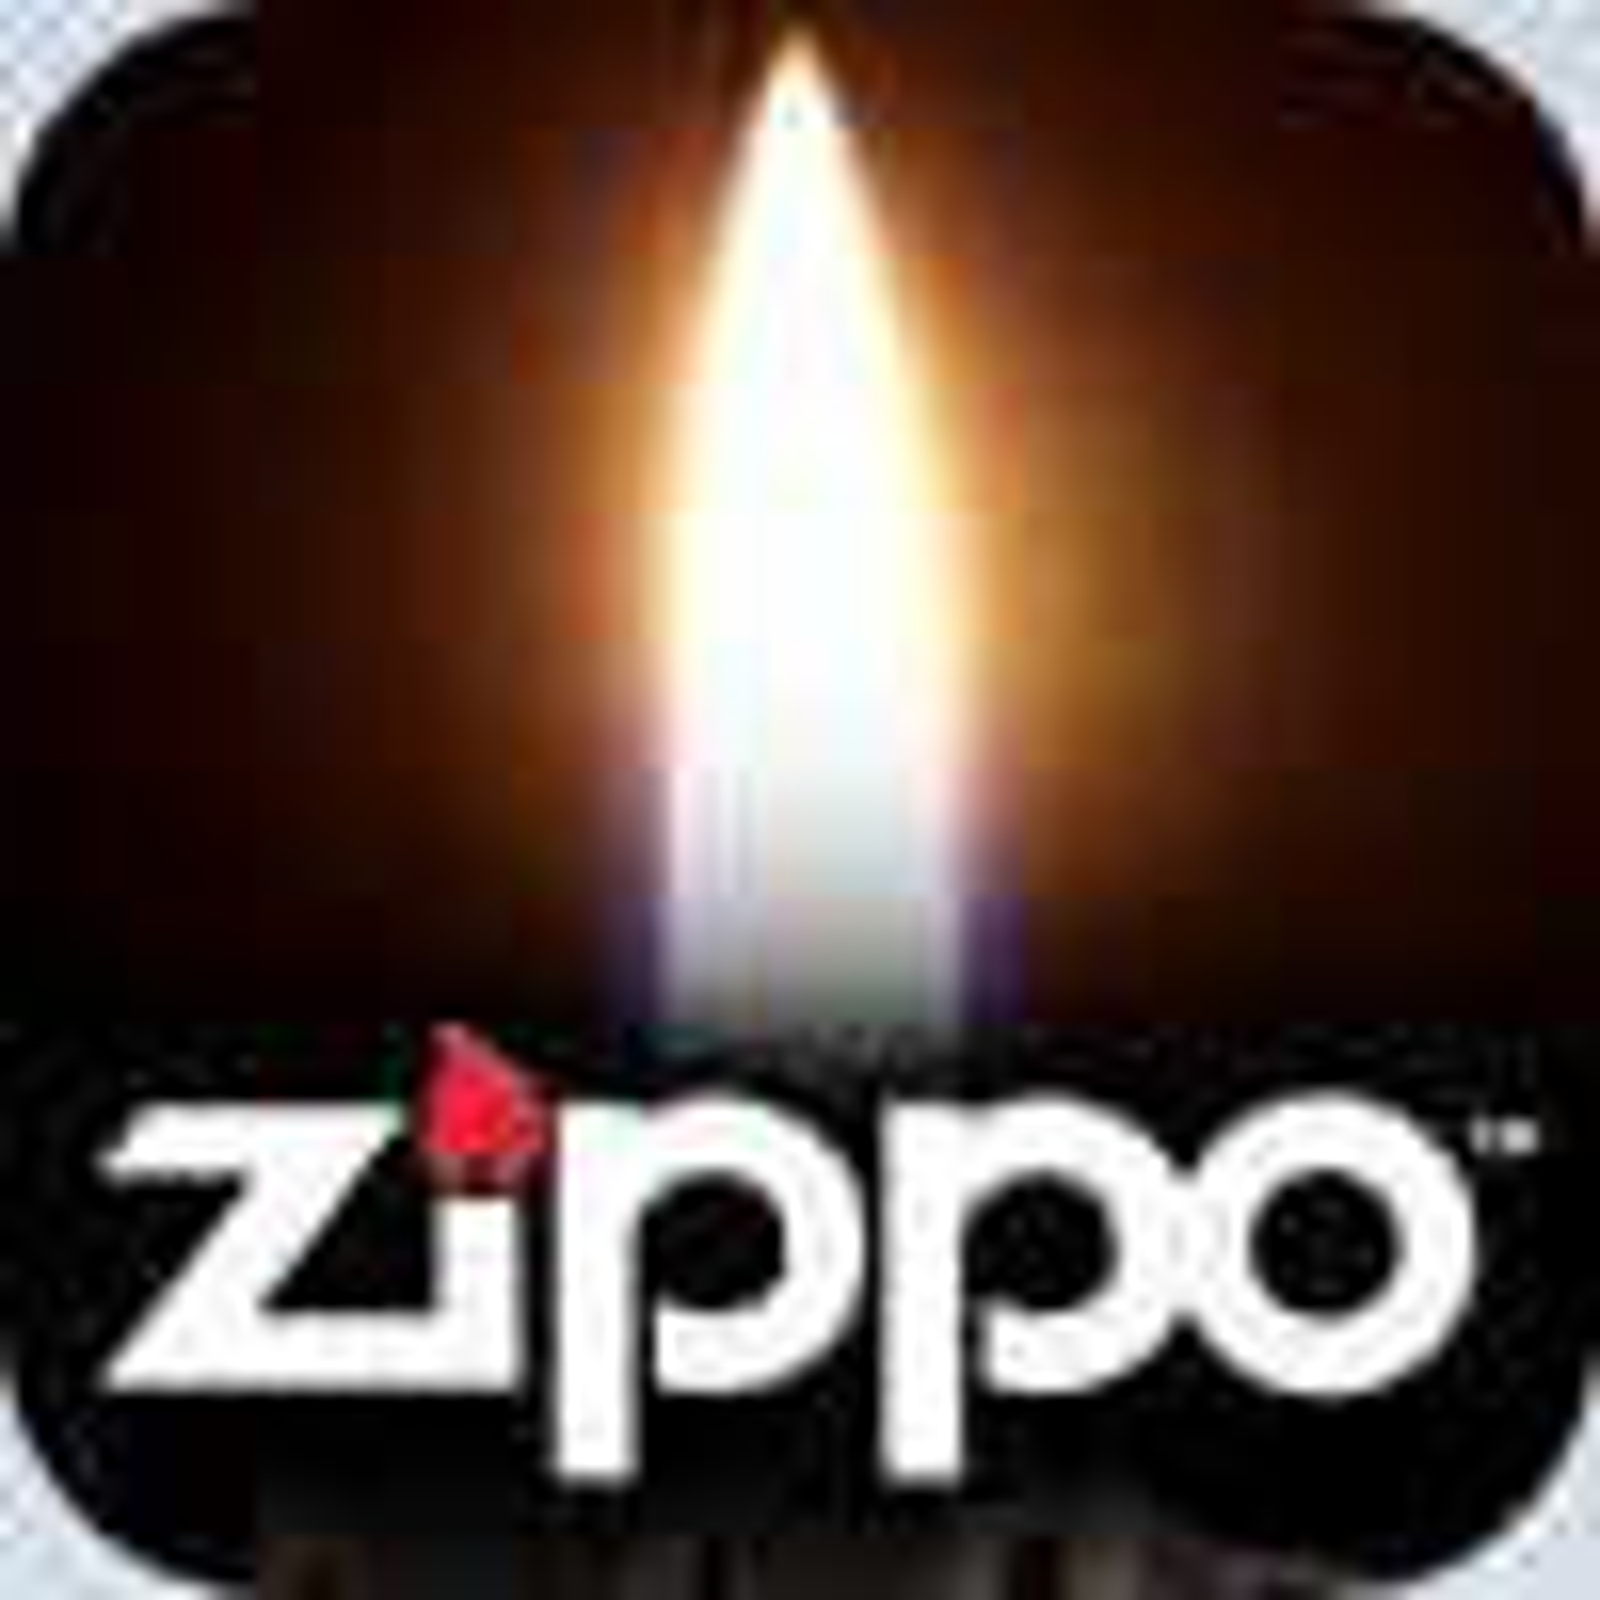 Virtual Zippo Lighter